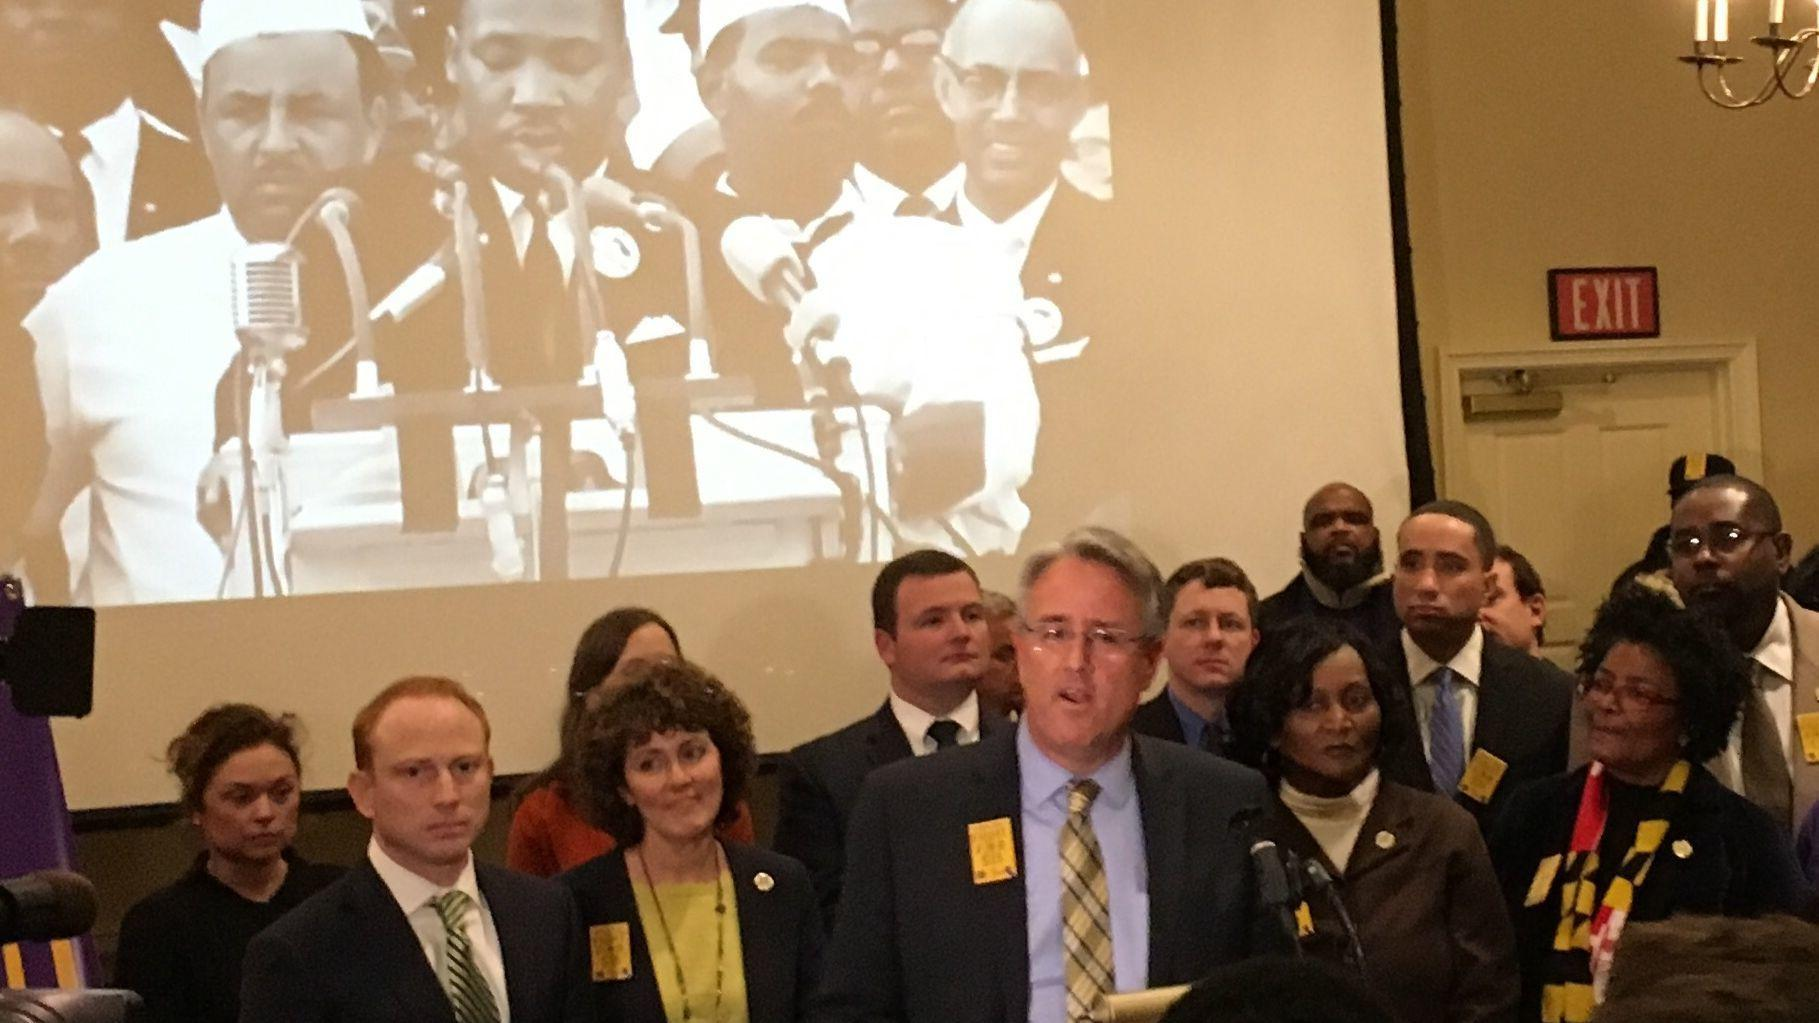 - Wage Statewide Unions Baltimore Sun Launch Minimum Push Democrats For 15